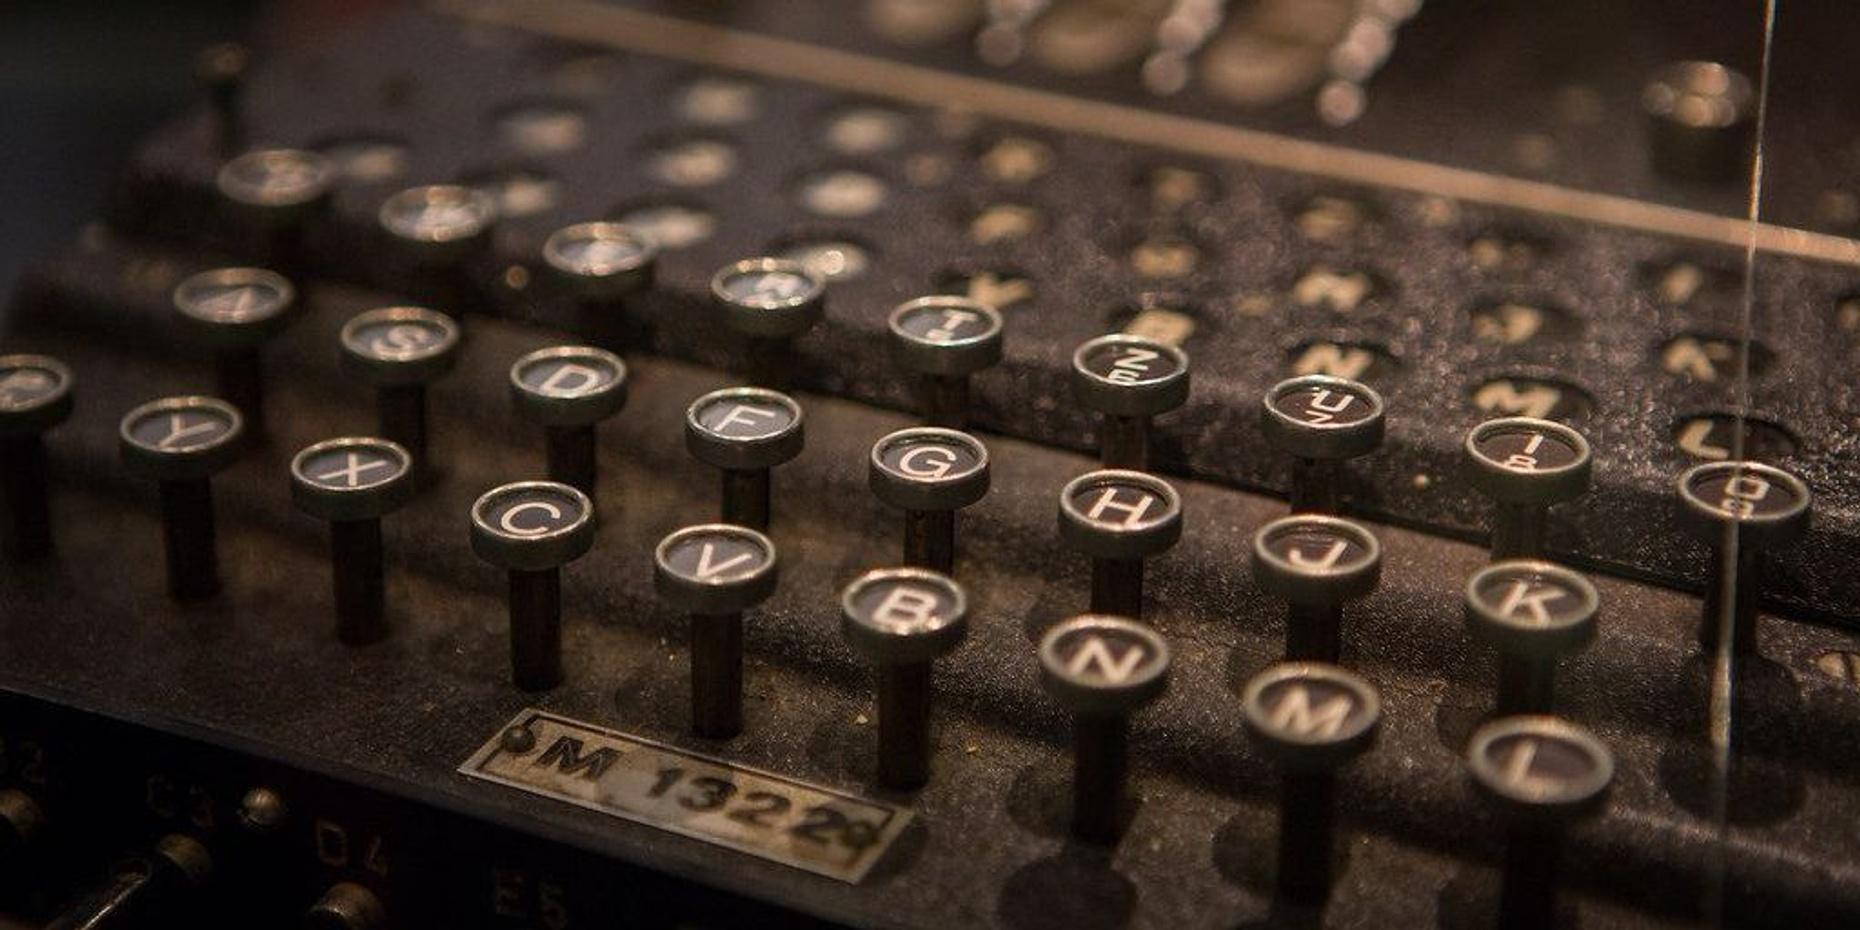 Enigma: Escape Room Game in Atlanta